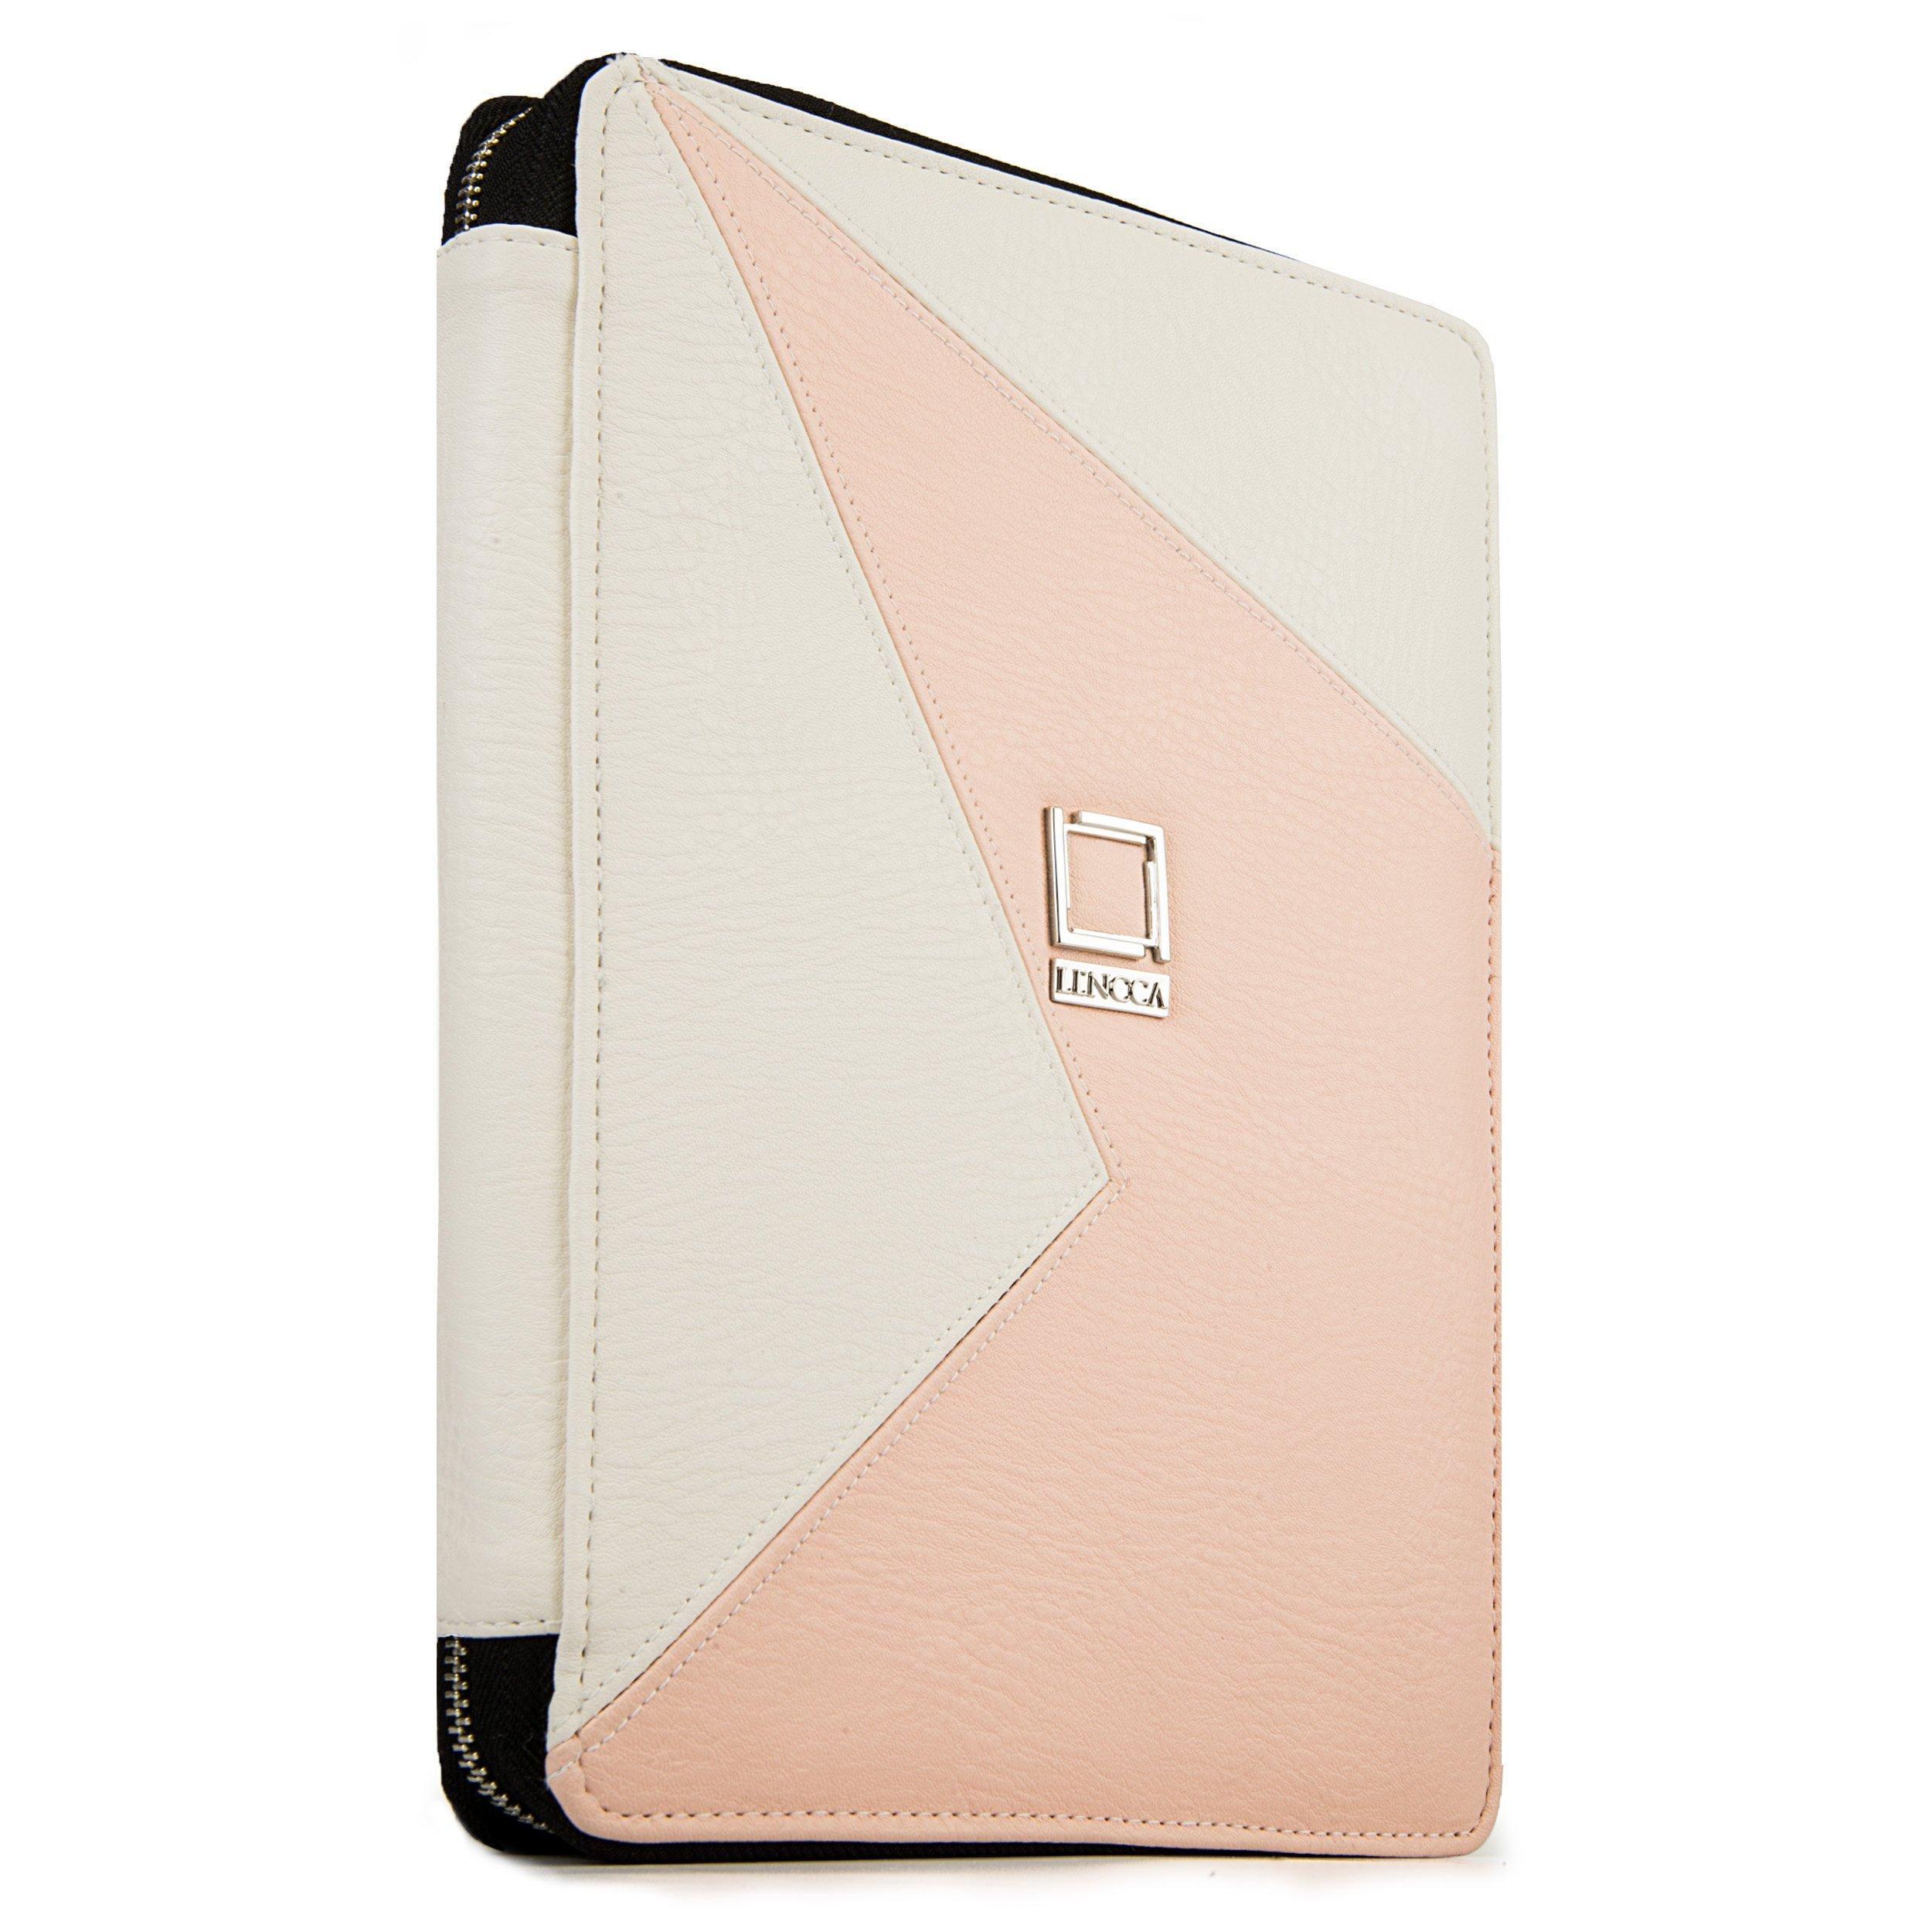 Lencca Minky Portfolio Briefcase for RCA Cambio W101 10.1-inch Tablet